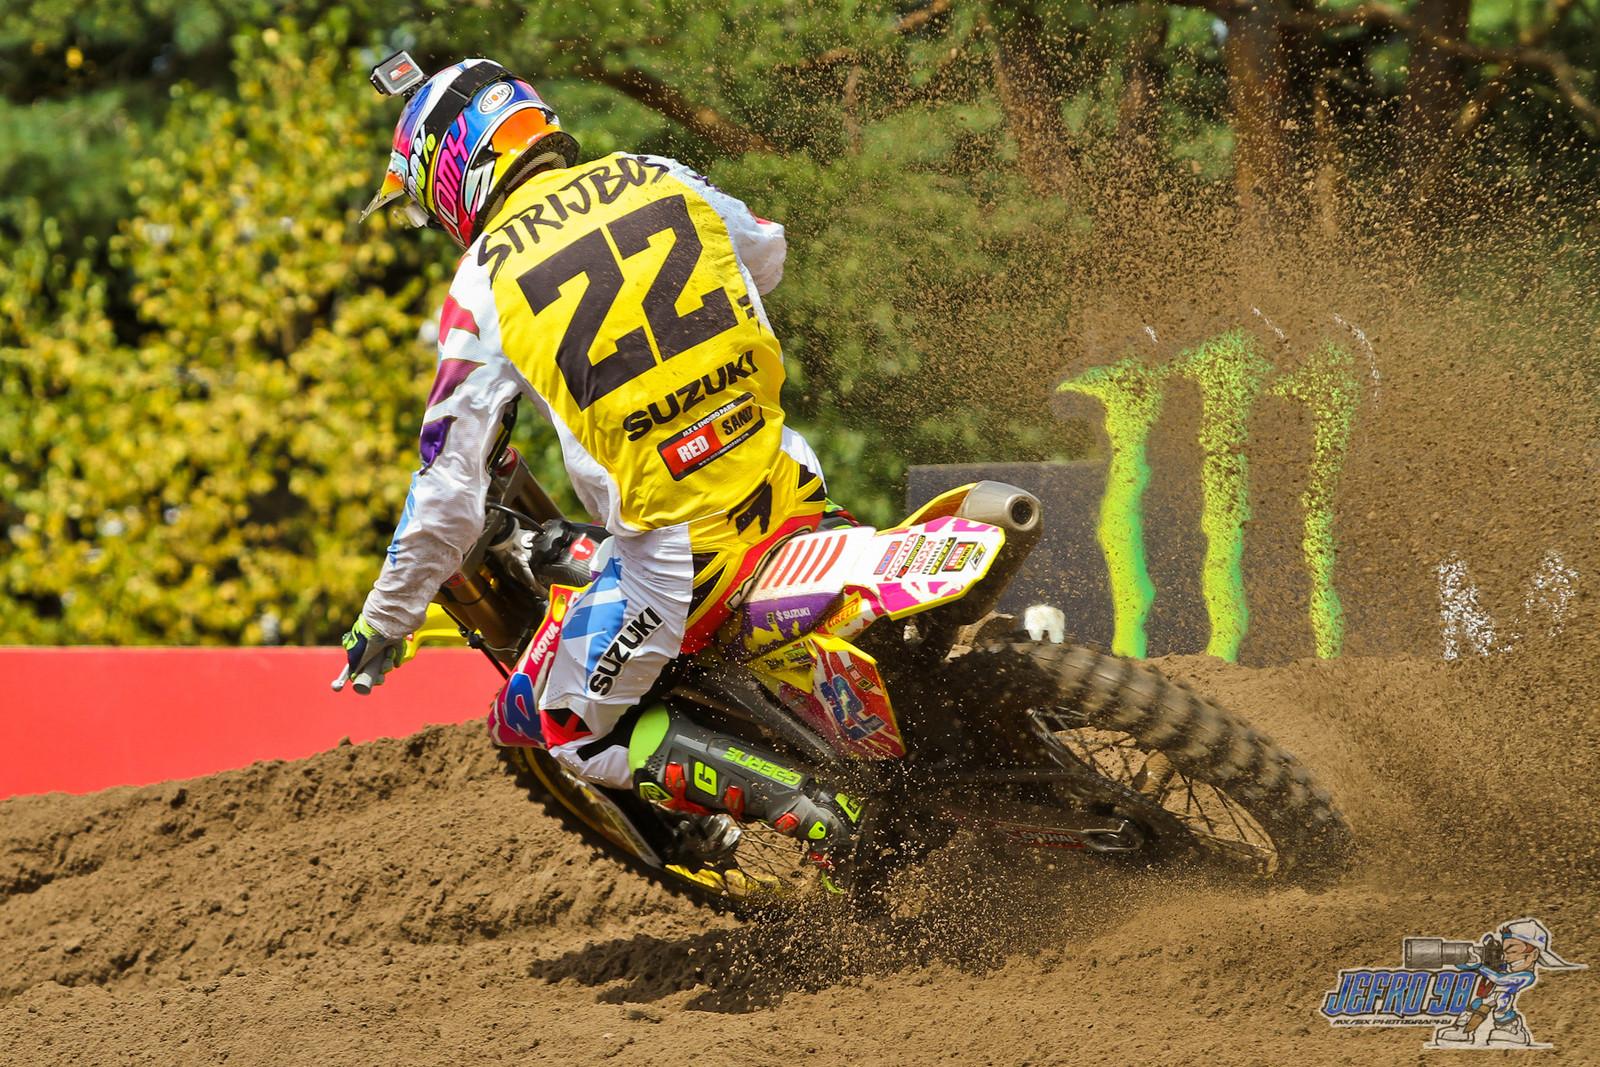 Kevin Strijbos - Photo Gallery: MXGP of Limburg - Motocross Pictures - Vital MX